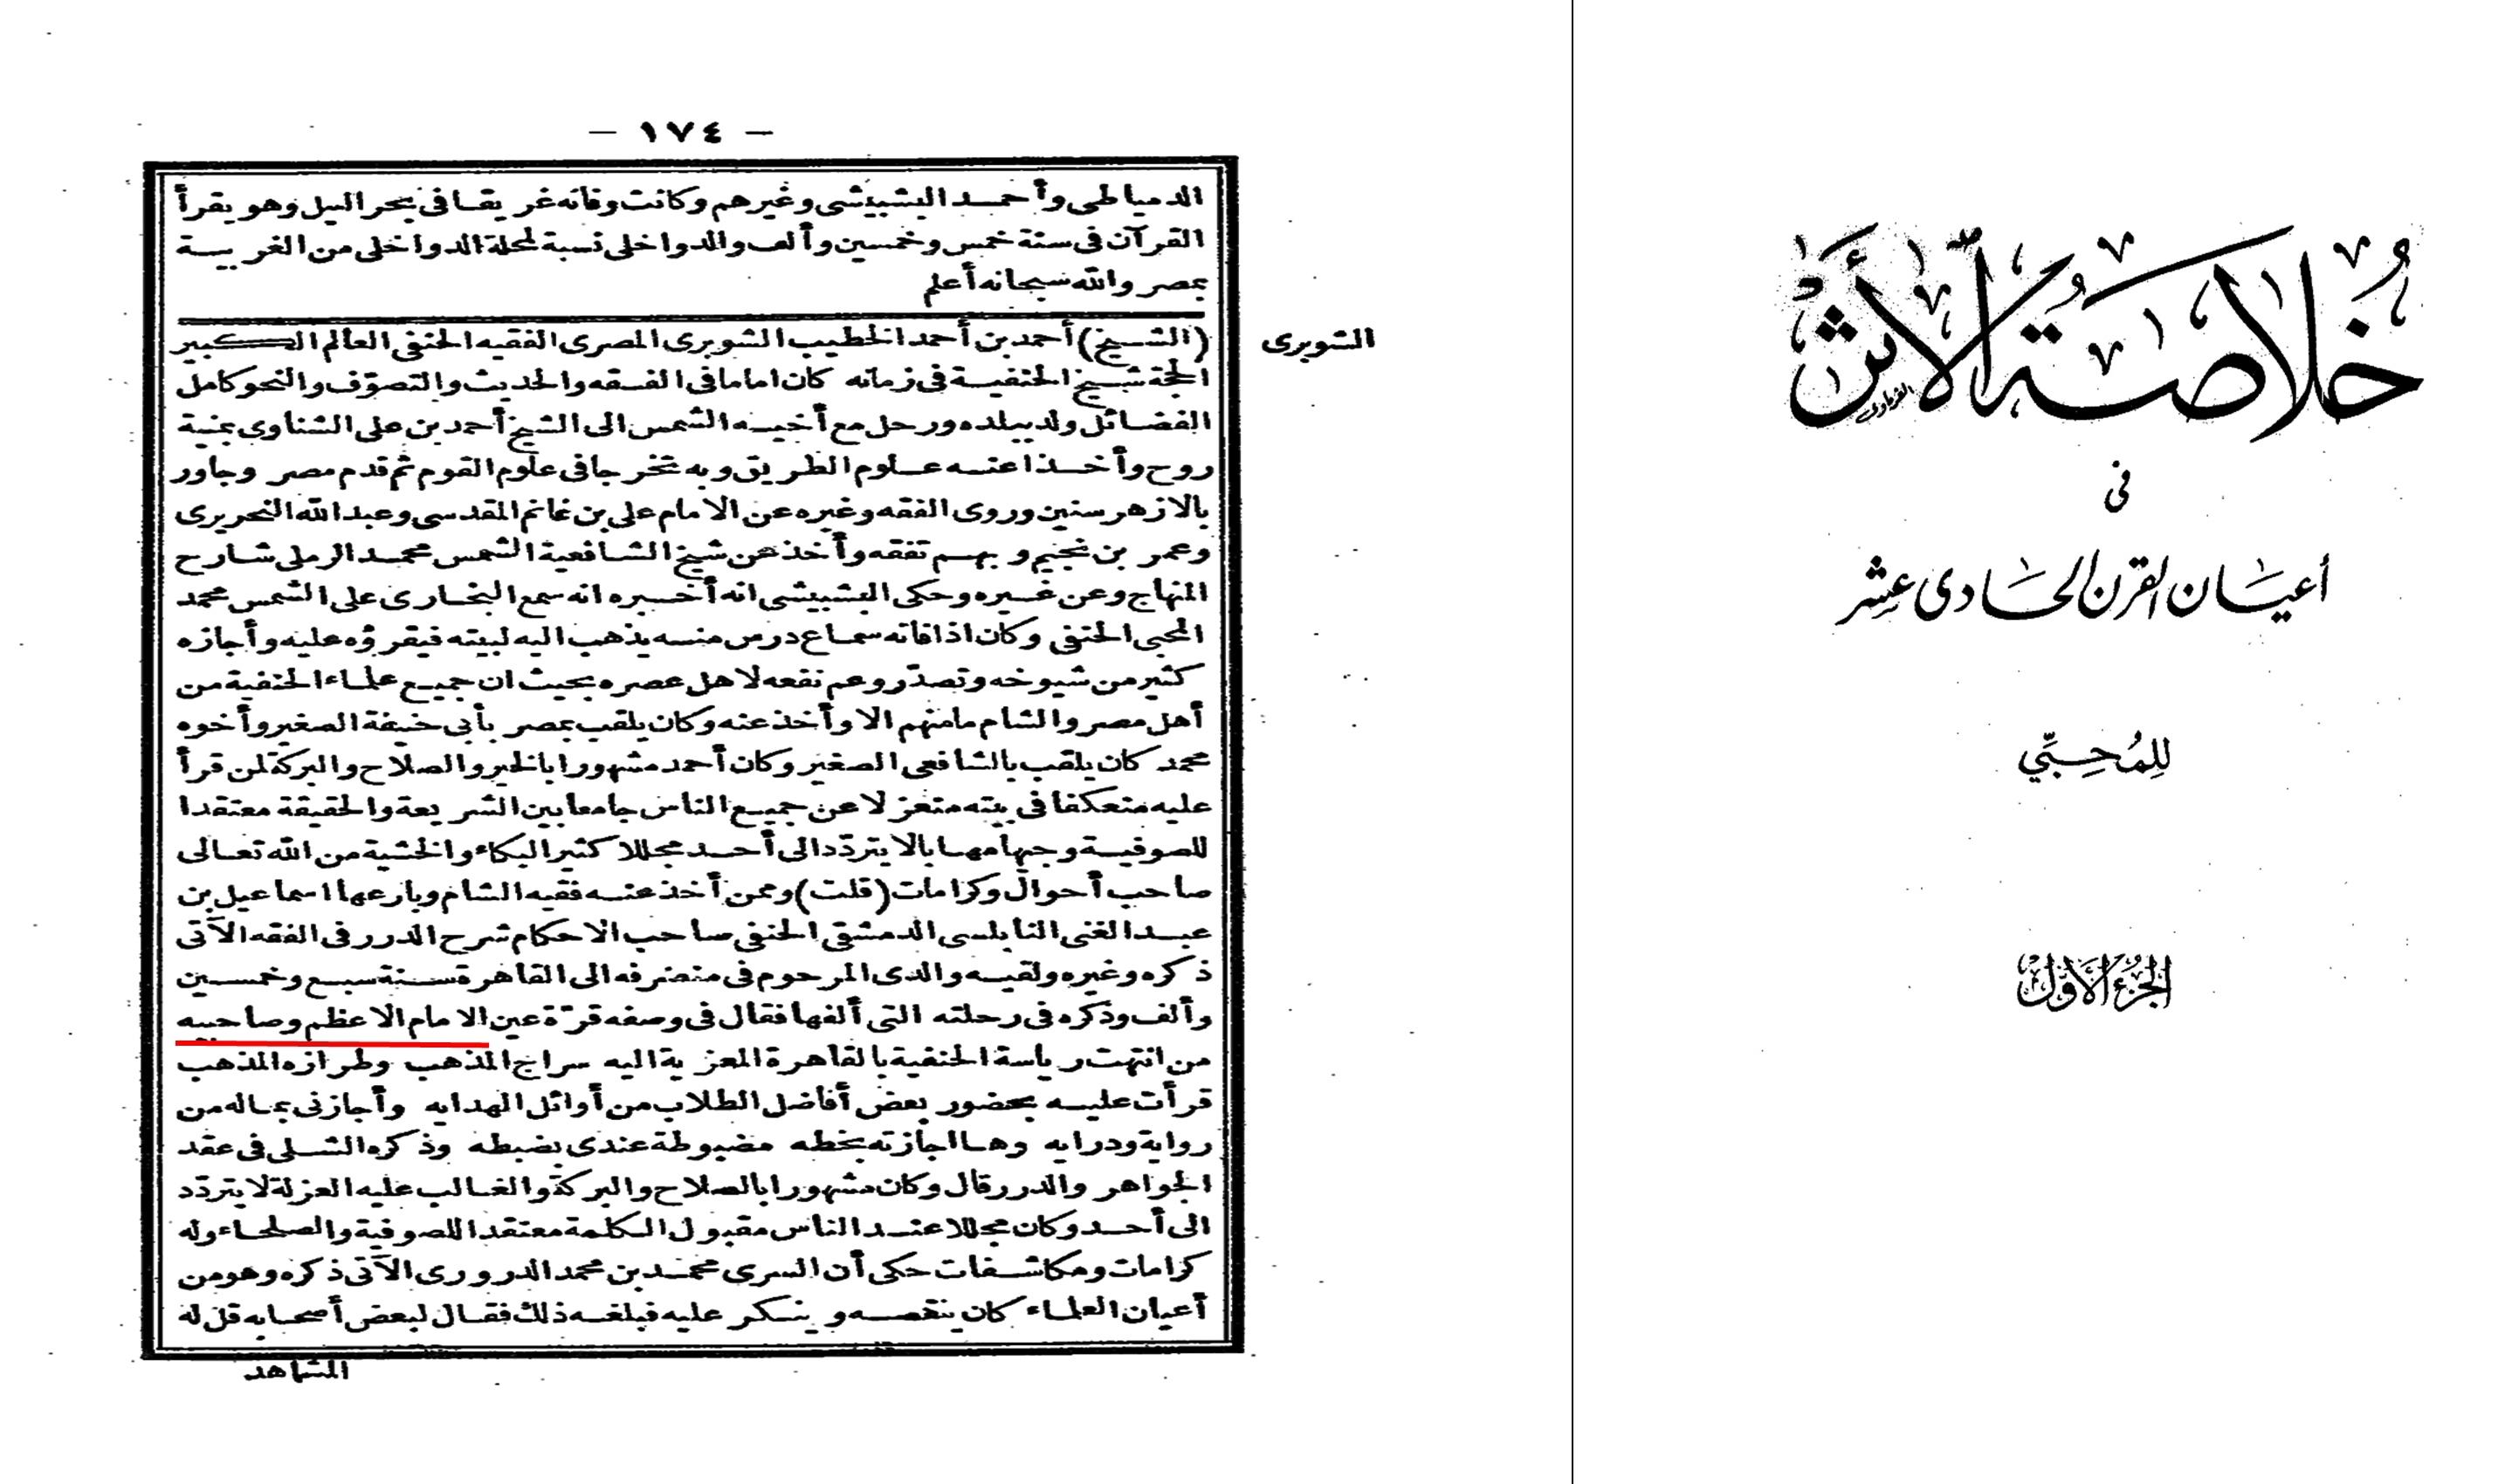 khulasatul asr 1 174c